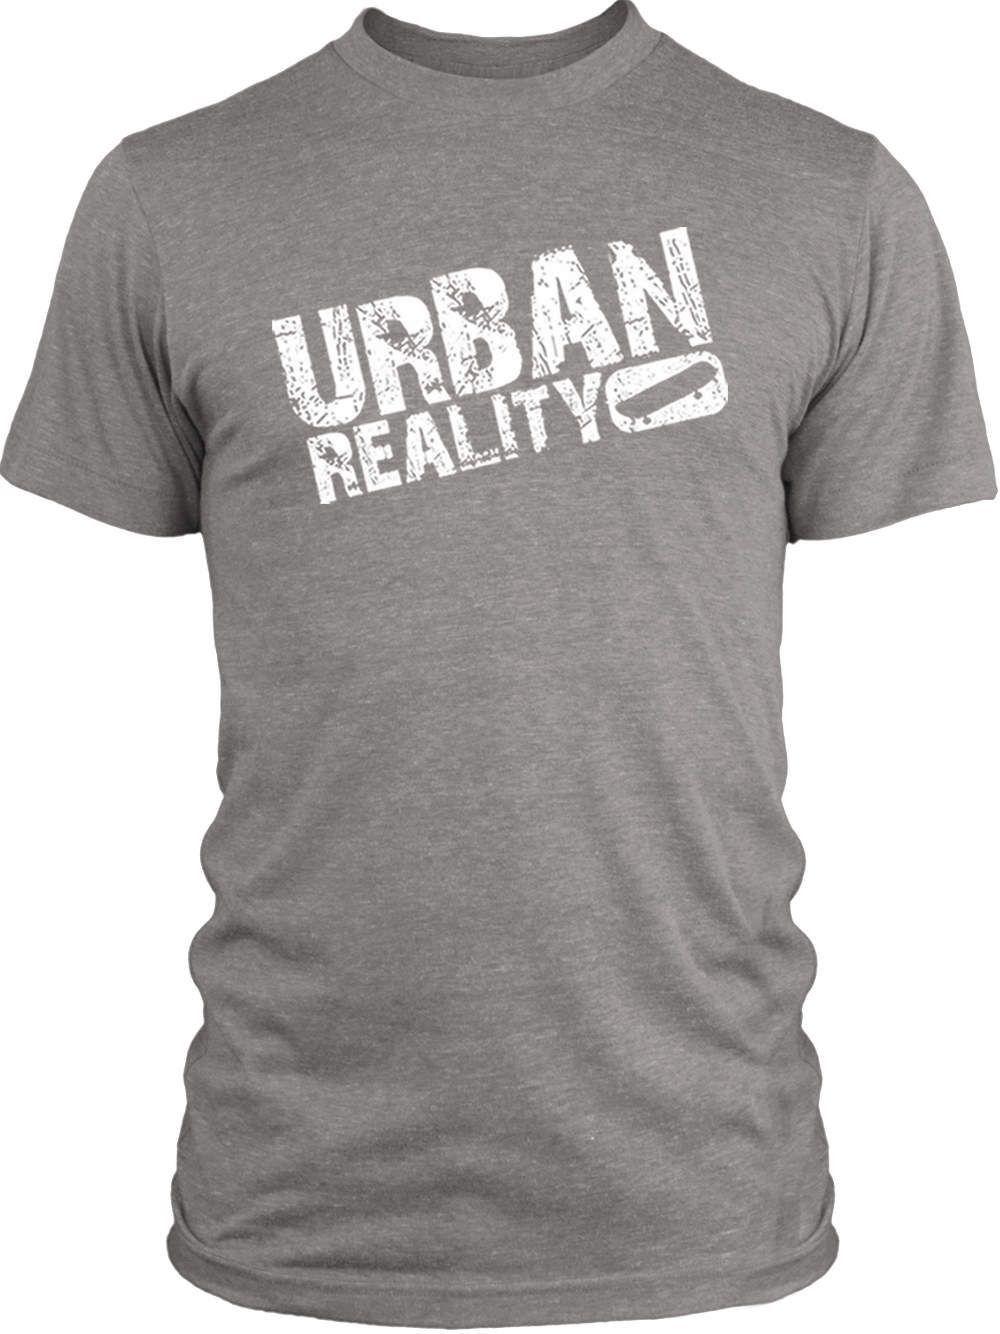 Big Texas Urban Reality (White) Vintage Tri-Blend T-Shirt